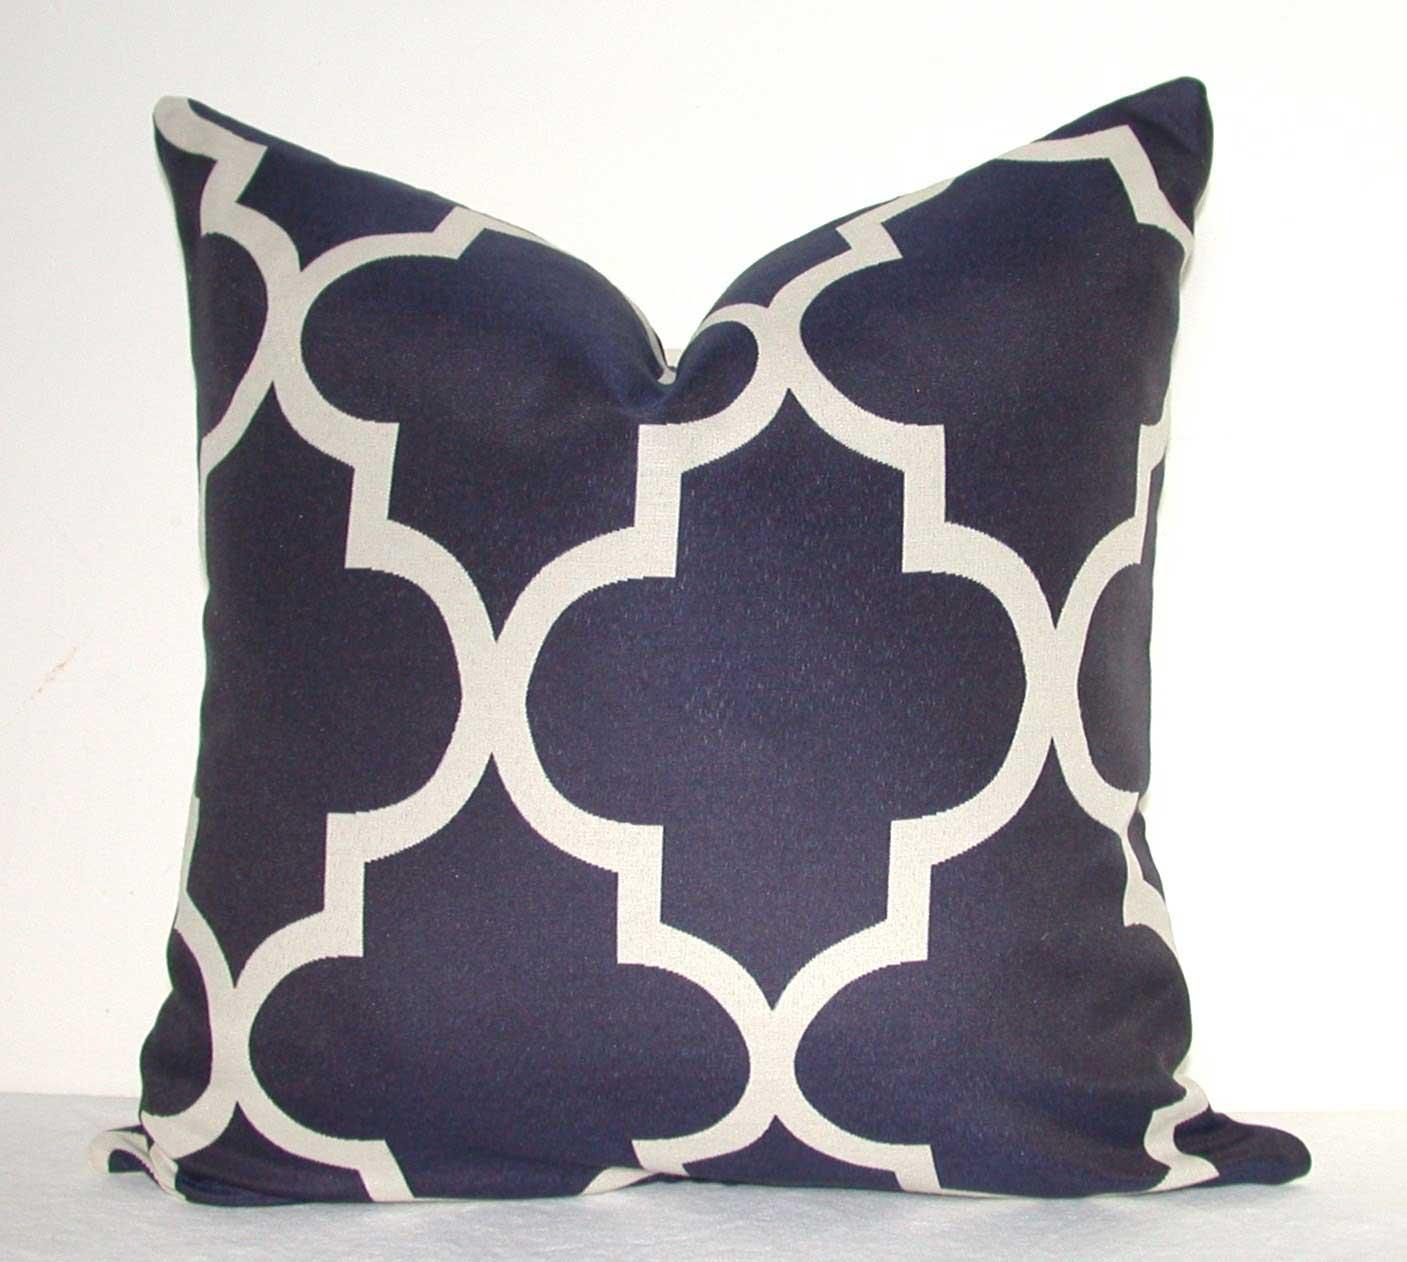 Kyoozi blue sofa pillow cases